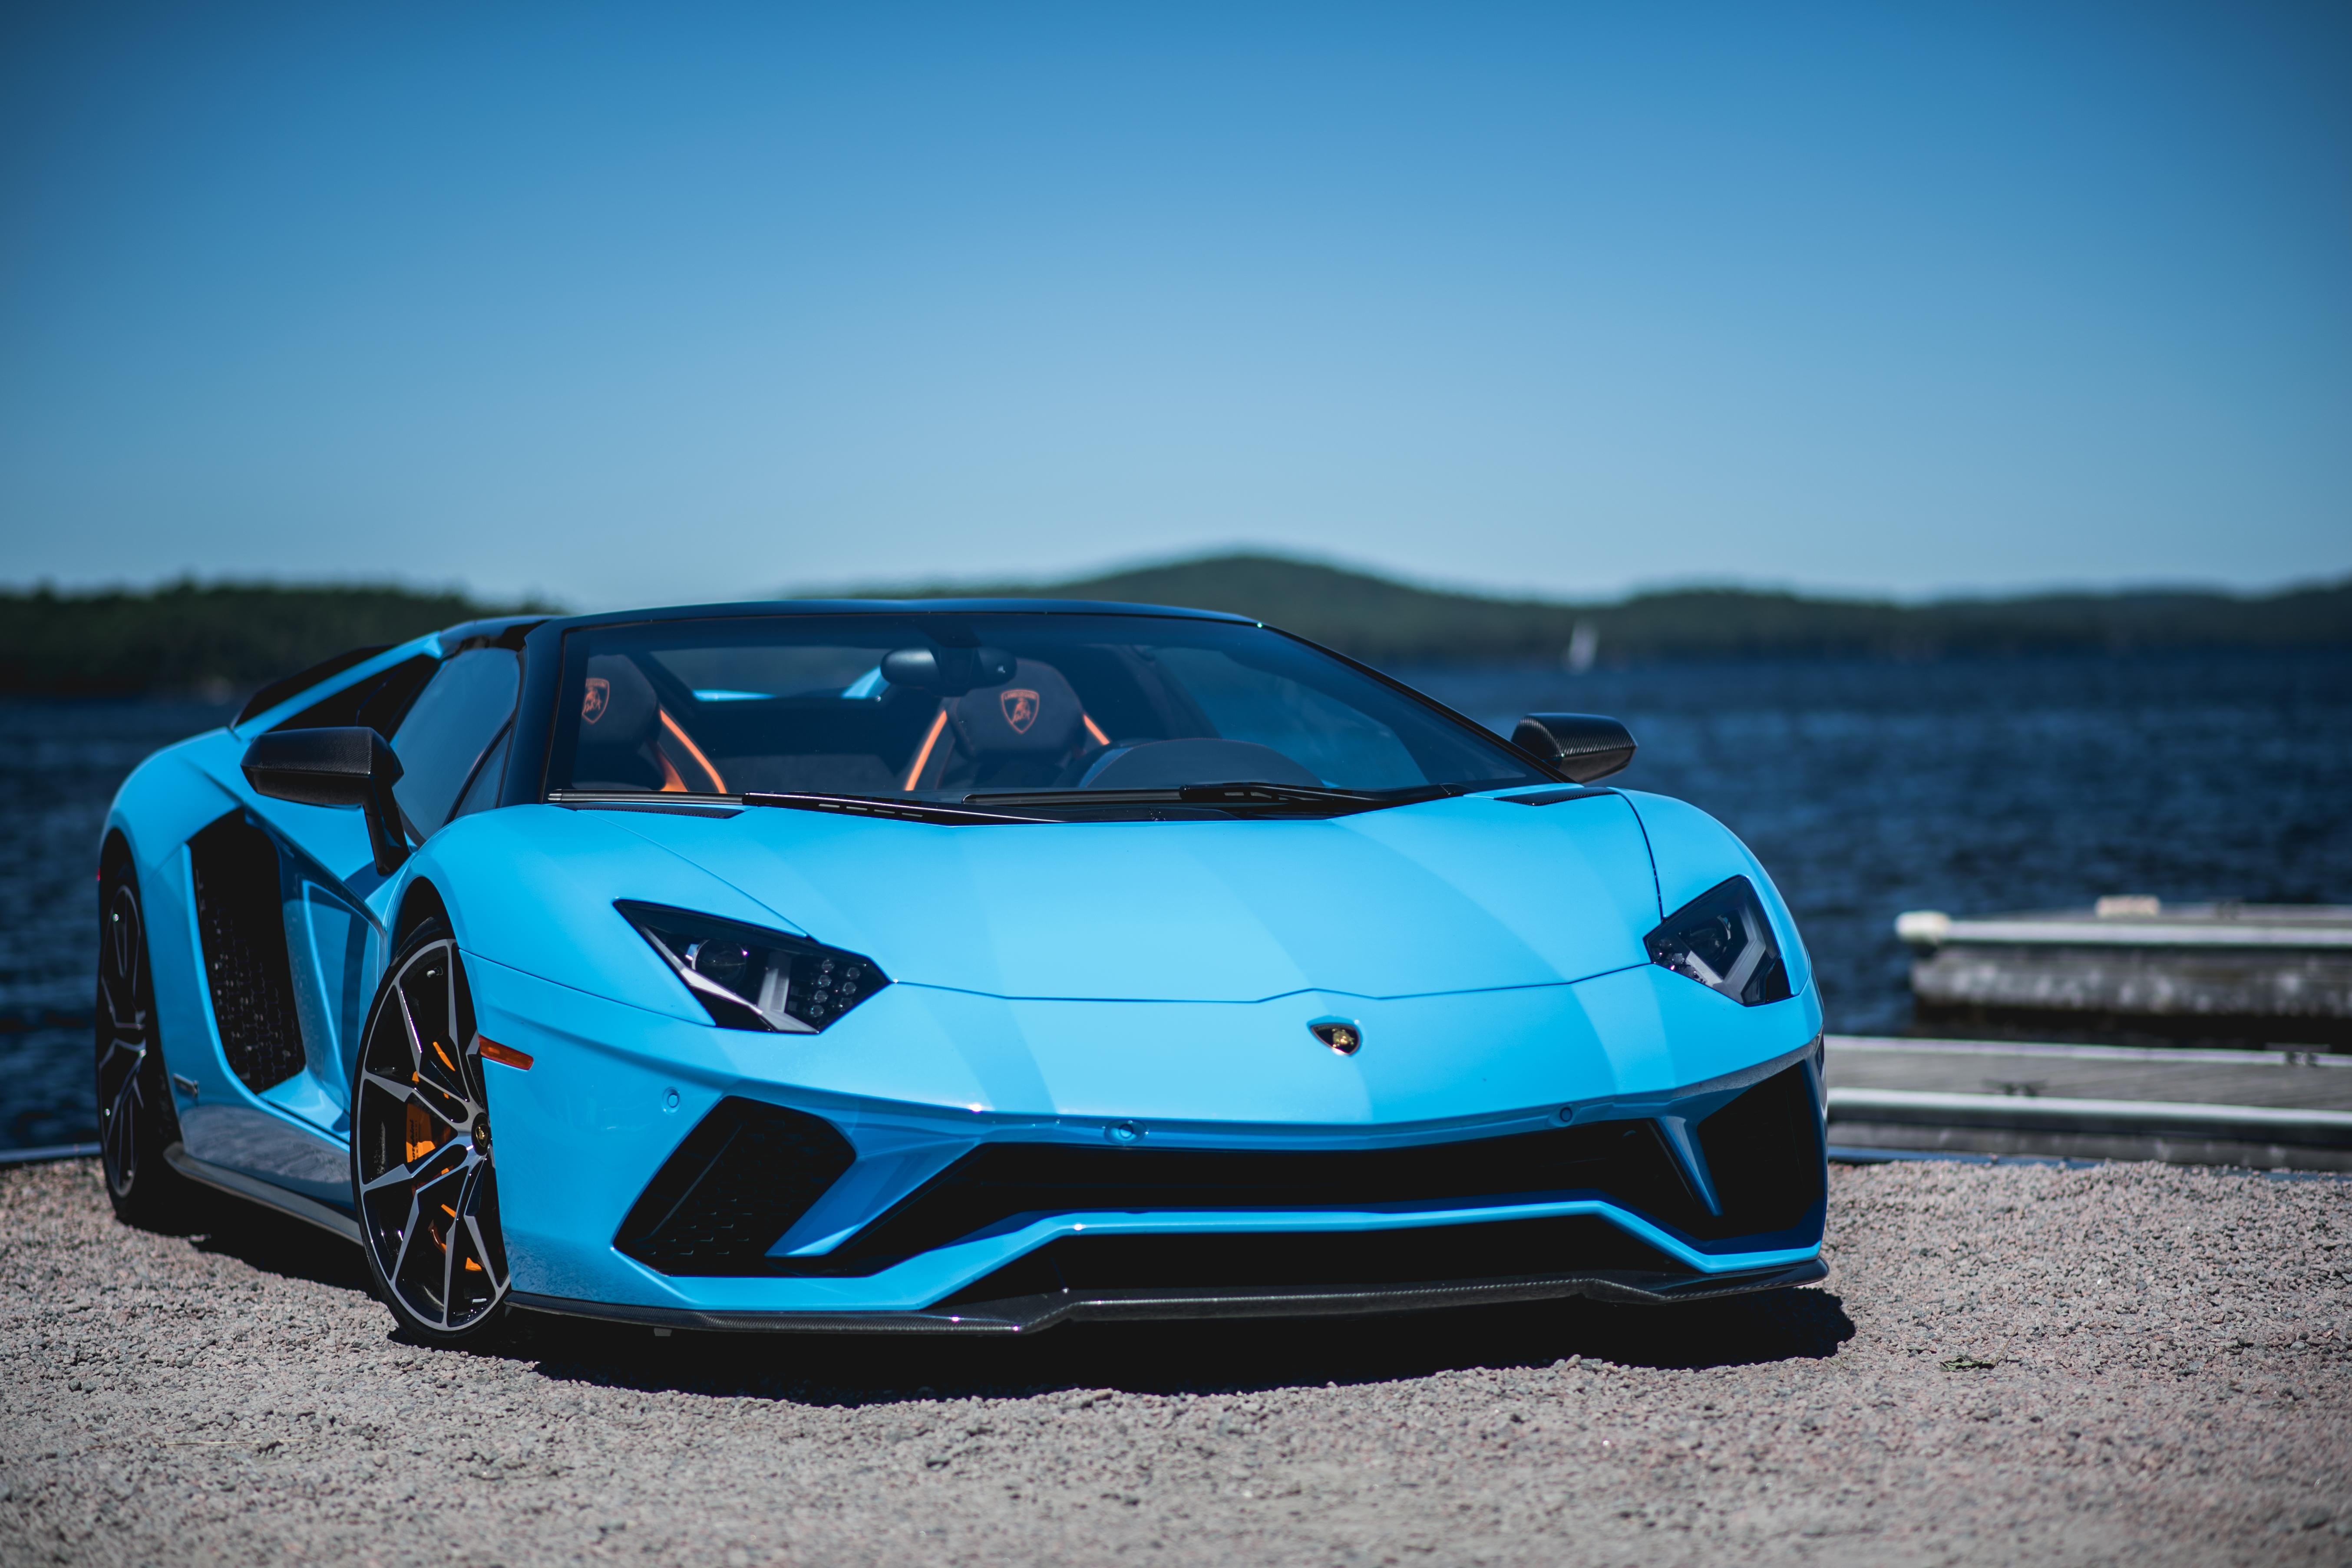 First Drive: 2018 Lamborghini Aventador S Roadster